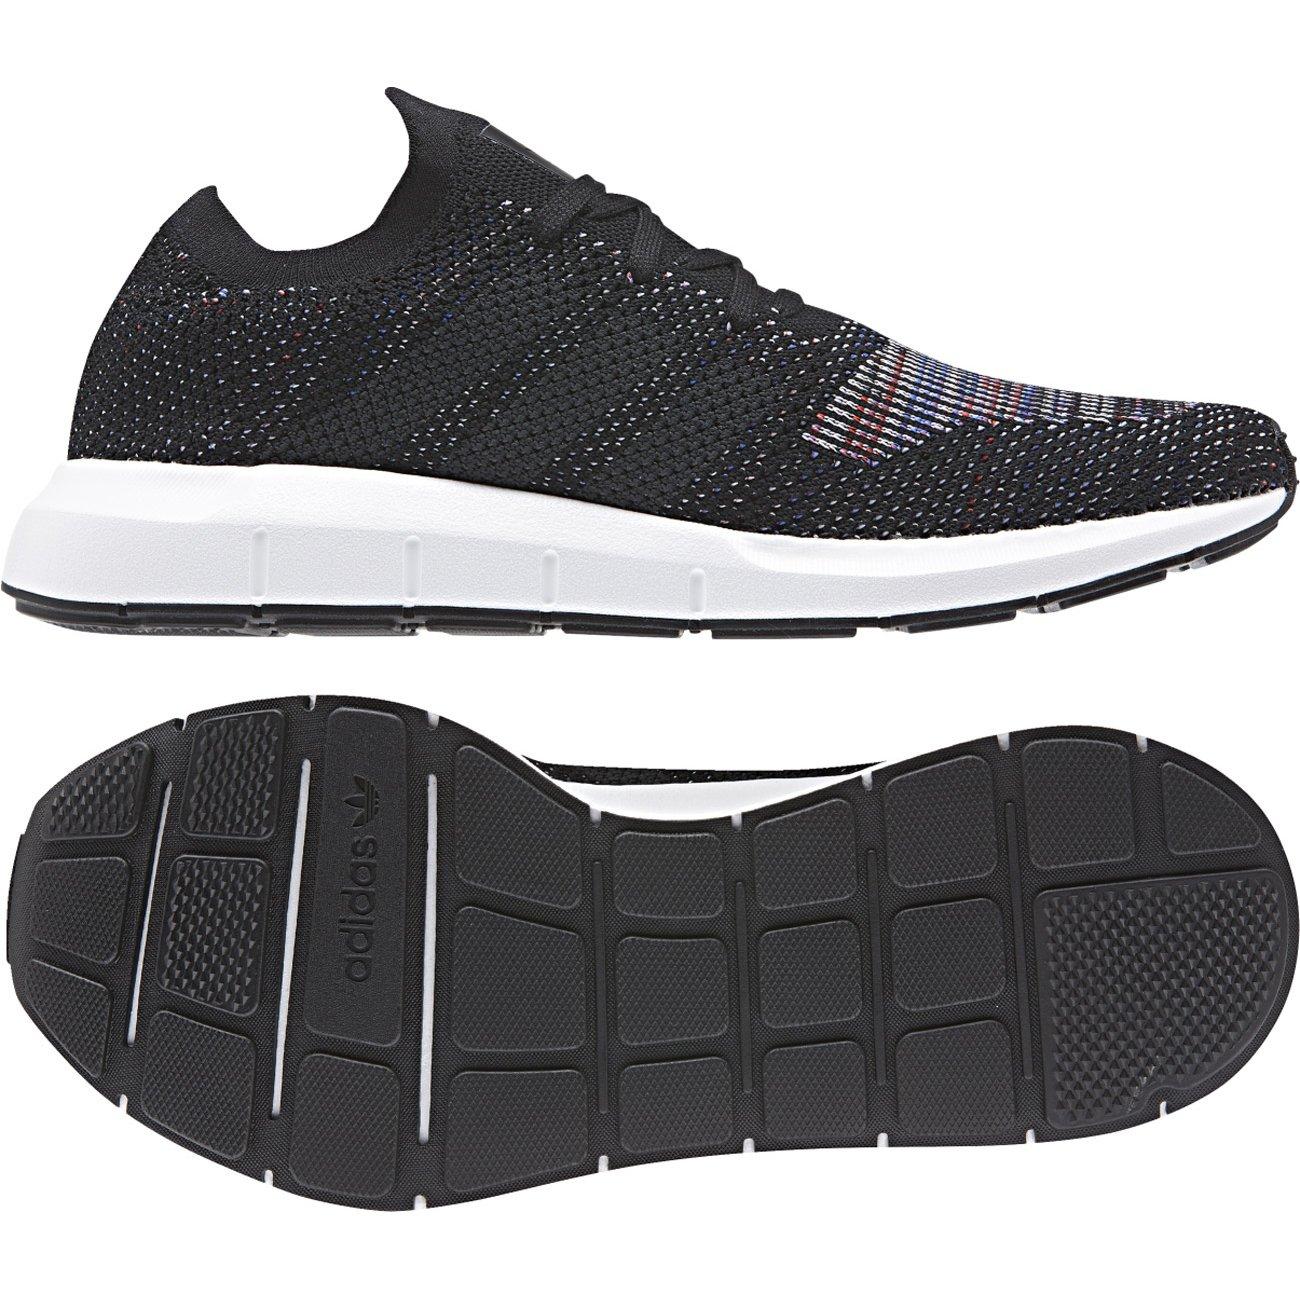 4c83c041b adidas Mens Originals Swift Run Pk Trainers in Black  Amazon.co.uk  Shoes    Bags